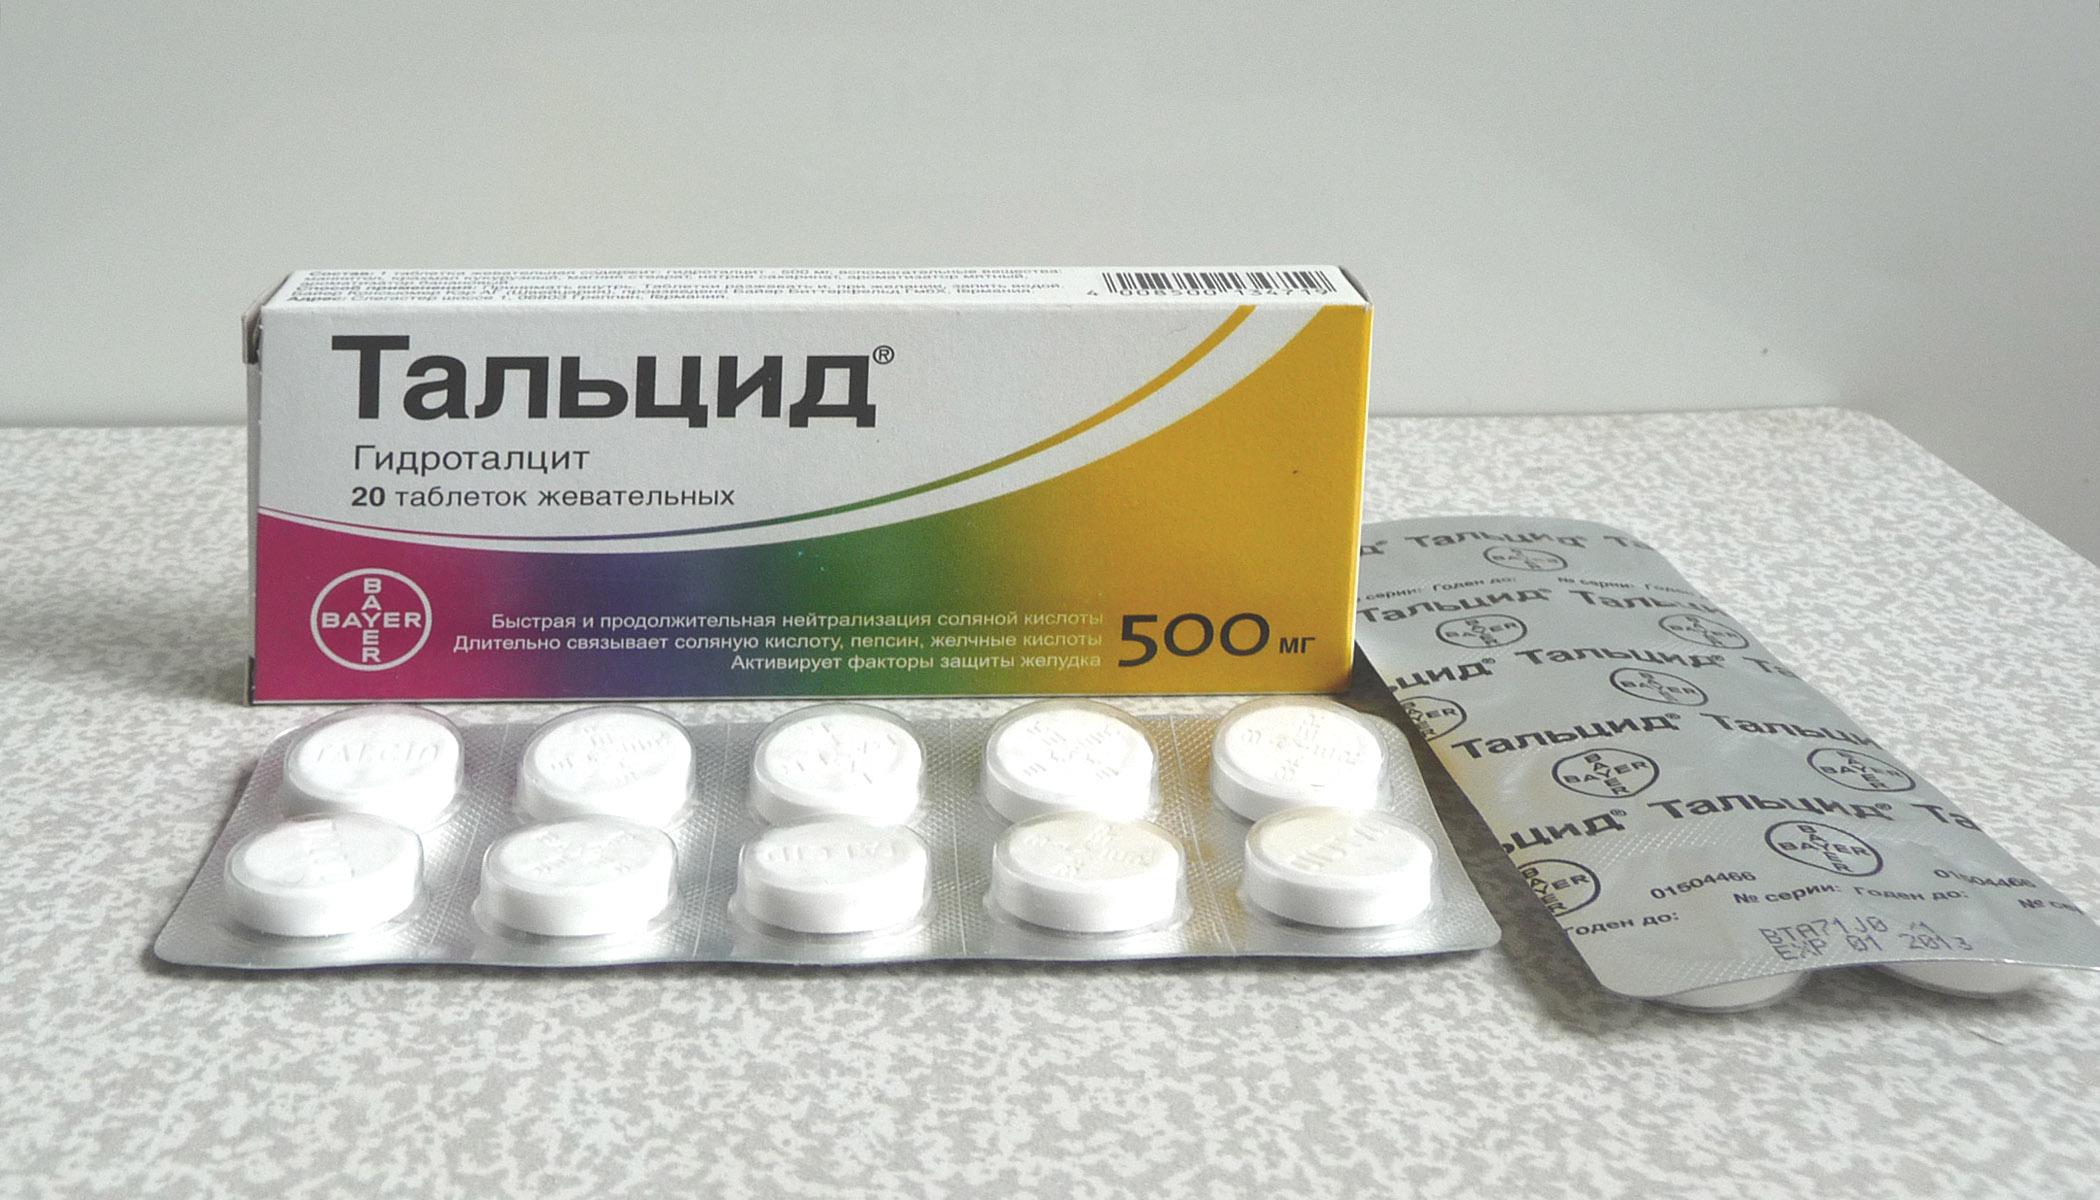 лекарственный препарат снижающий холестерин